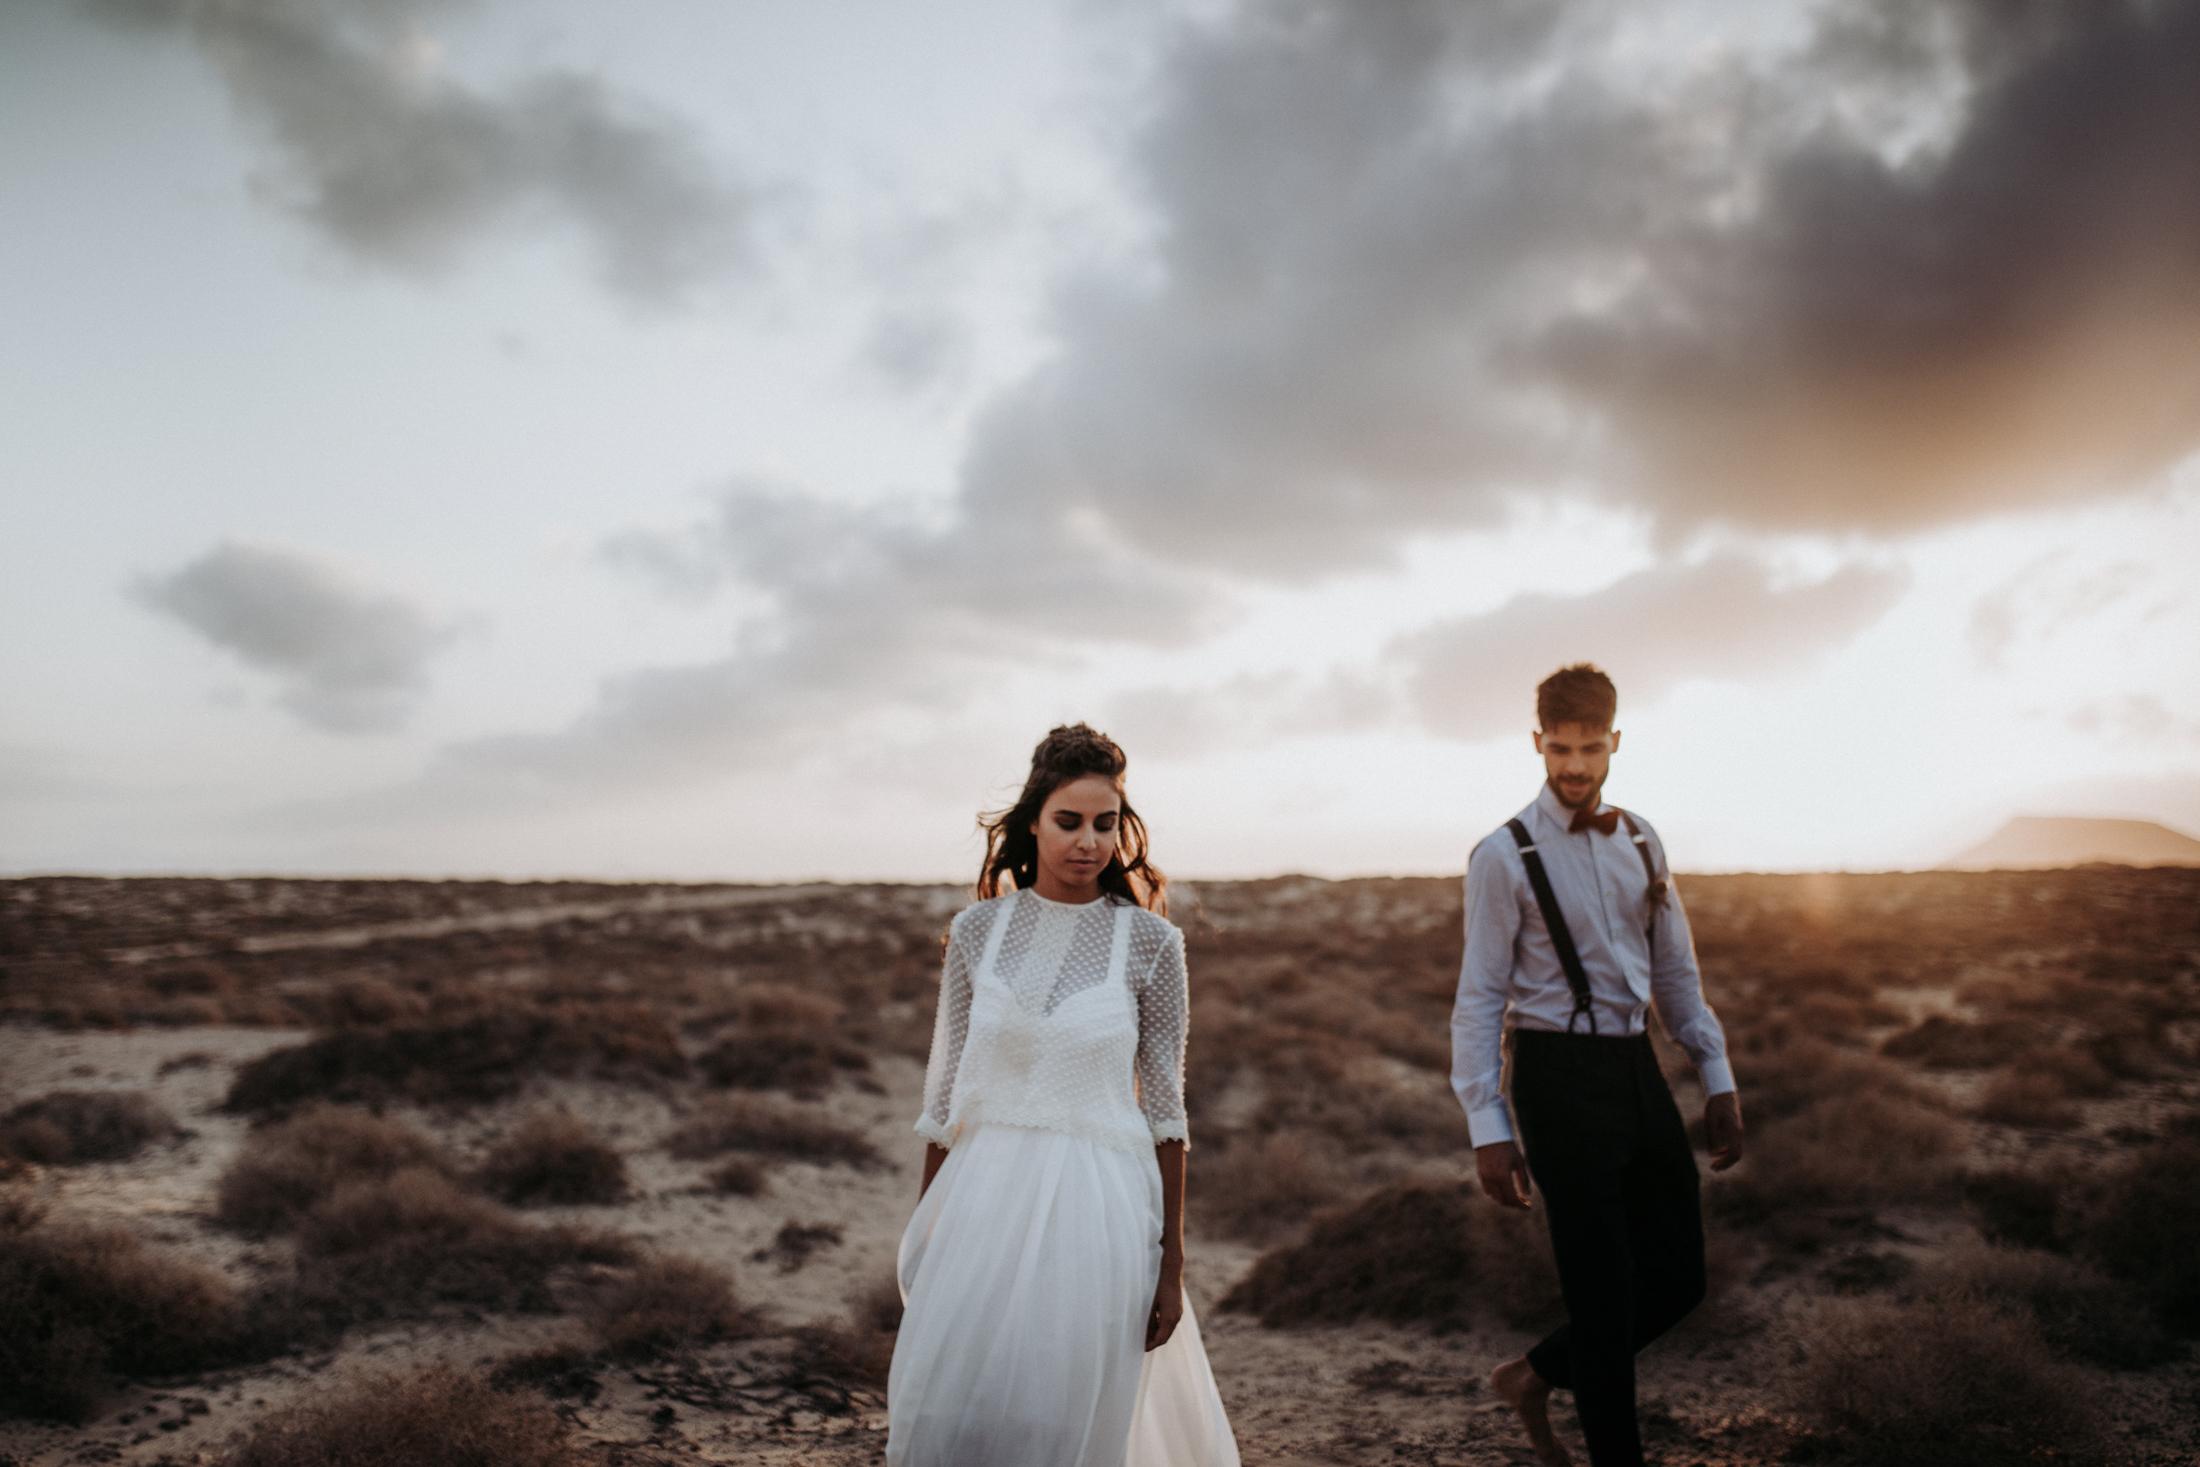 Wedding_Photographer_Mallorca_Daniela-Marquardt_Photography_CanaryIslands_Lanzarote_Iceland_Tuskany_Santorini_Portugal_Schweiz_Austria_Bayern_Elopement_Hochzeitsfotograf_11